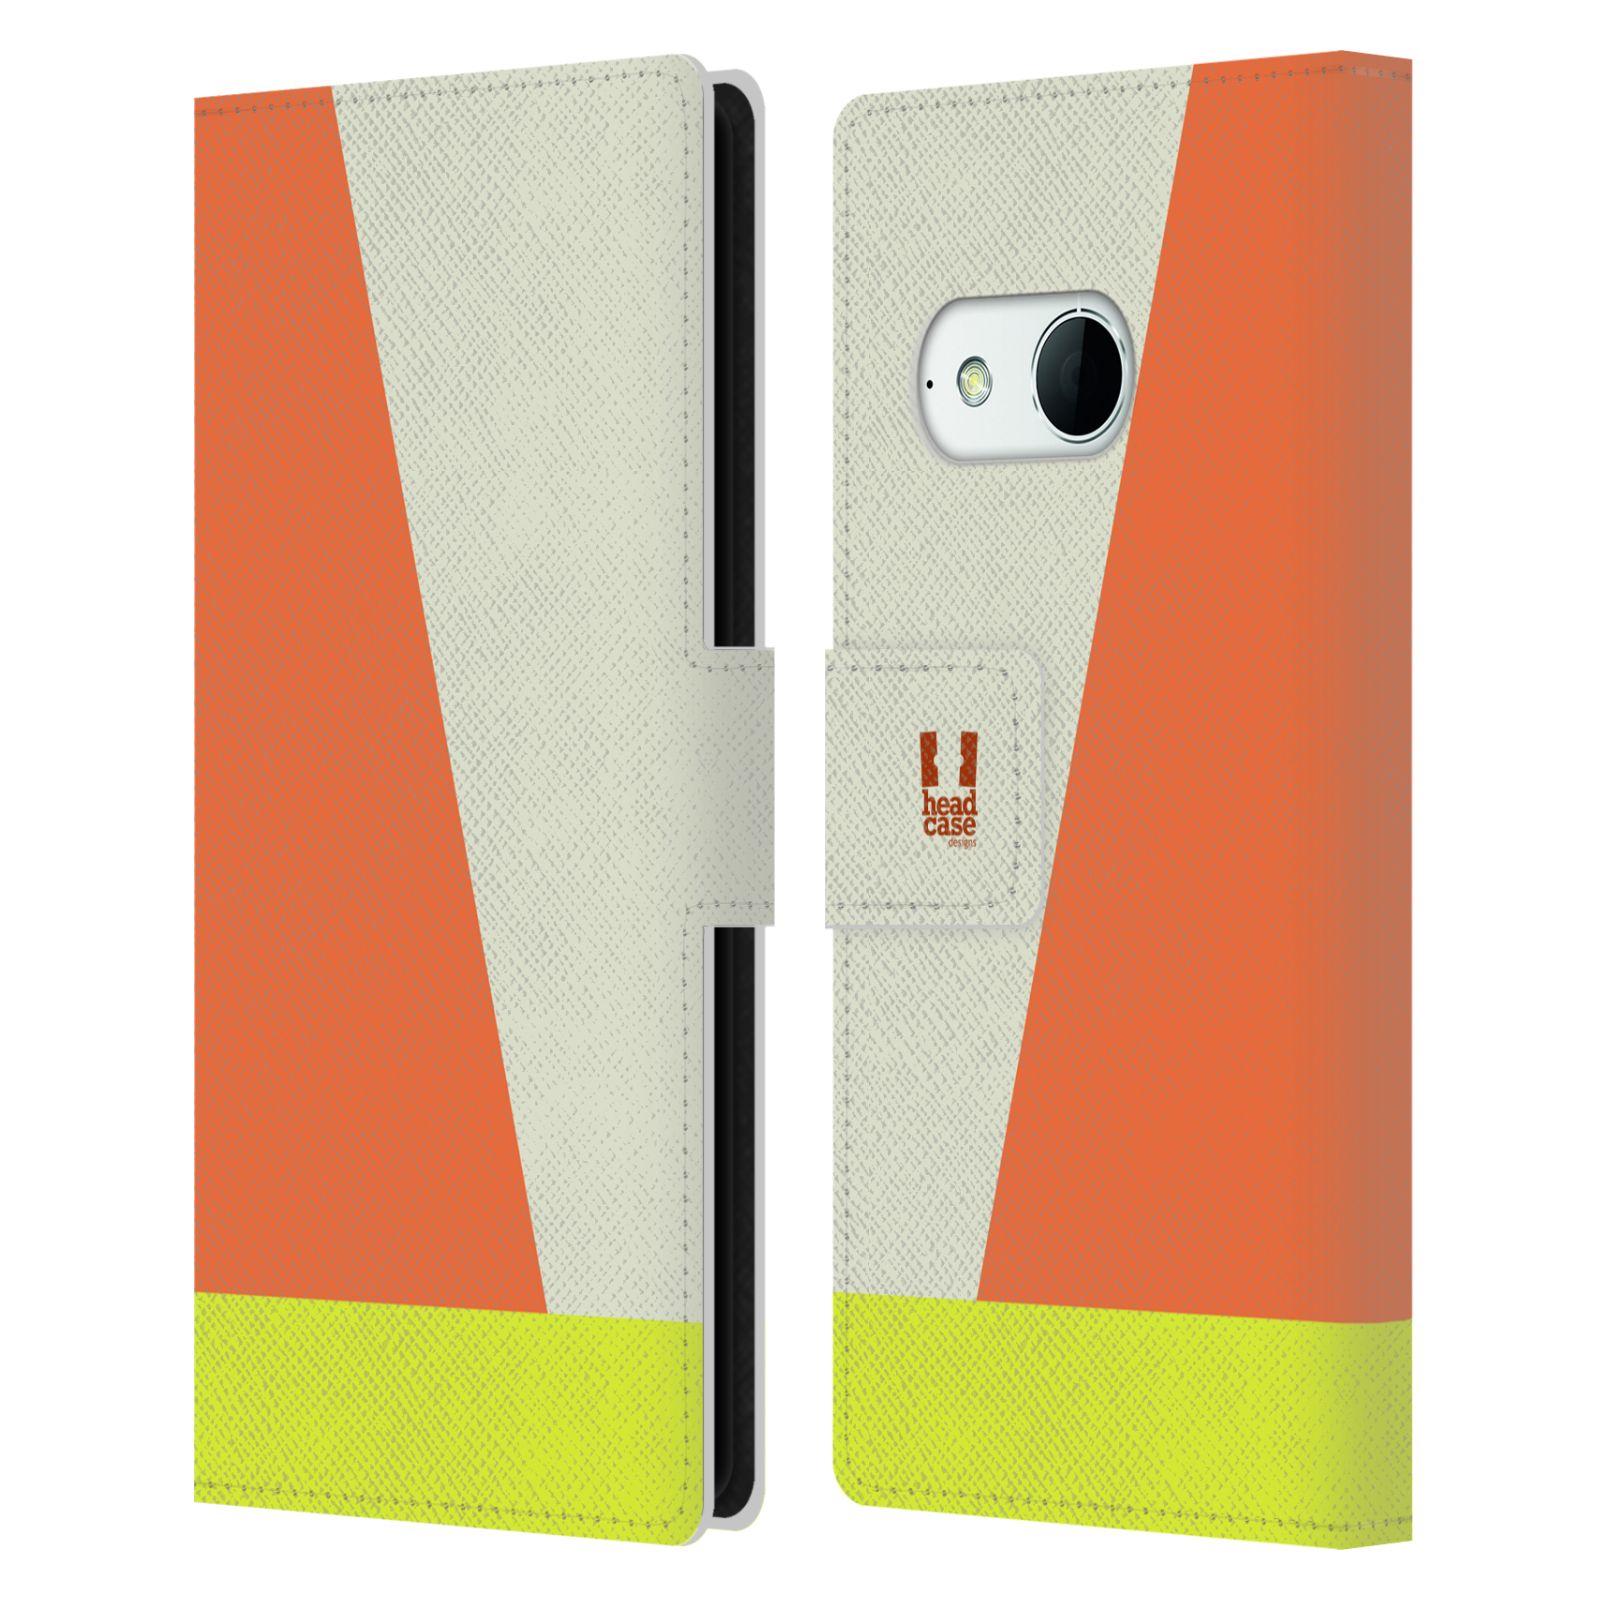 HEAD CASE Flipové pouzdro pro mobil HTC ONE MINI 2 barevné tvary slonová kost